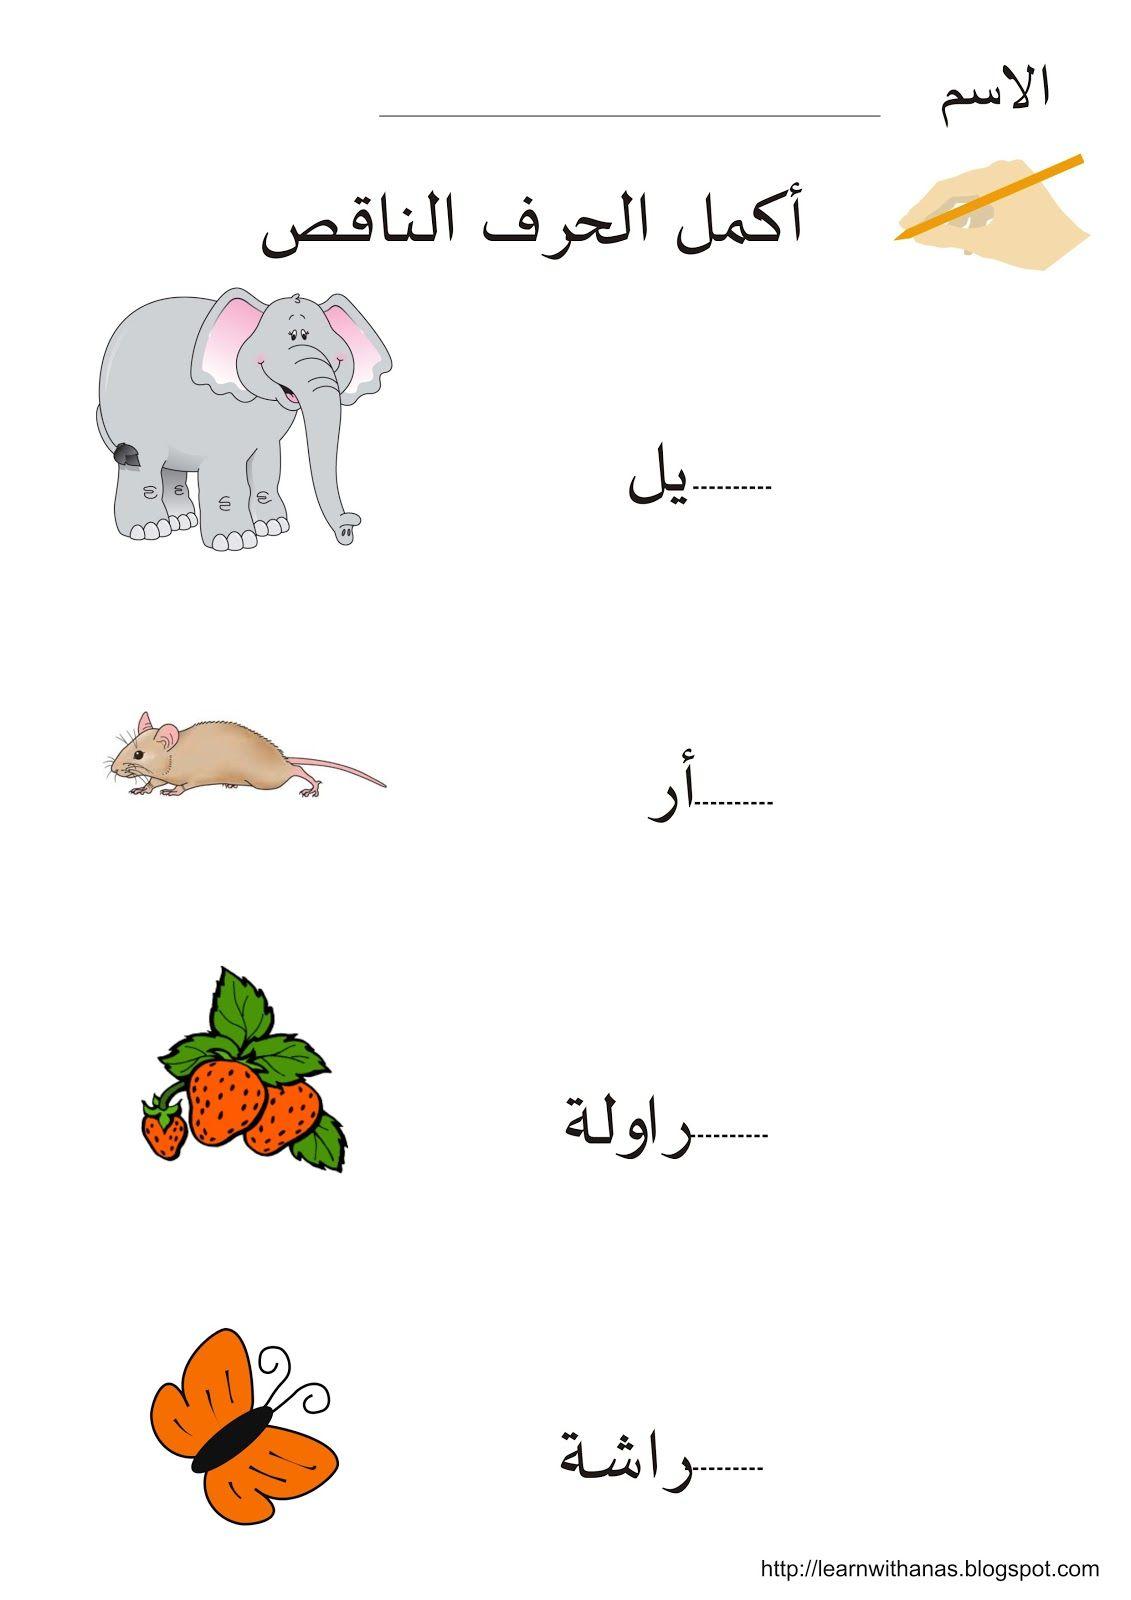 196 Emo Hairstyles For Short Hair Hairstyles 2019 Arabic Alphabet Letters Arabic Alphabet For Kids Arabic Alphabet